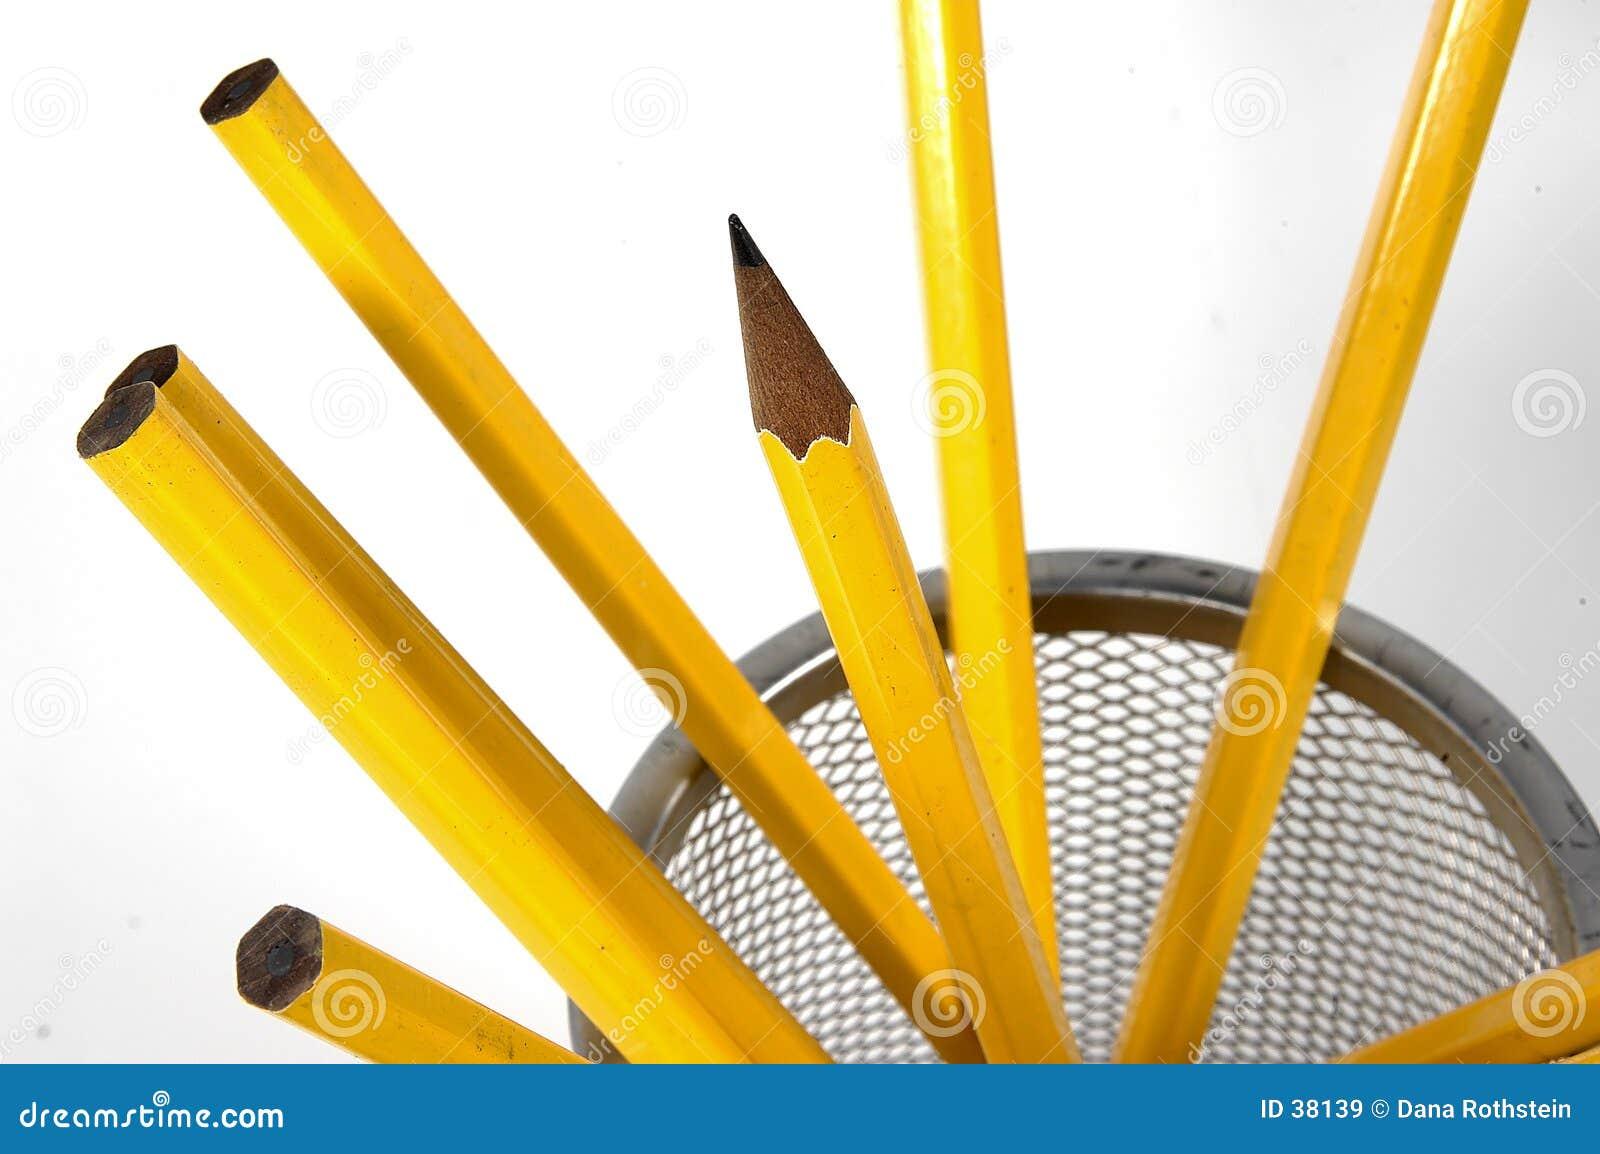 Crayons Unsharpened